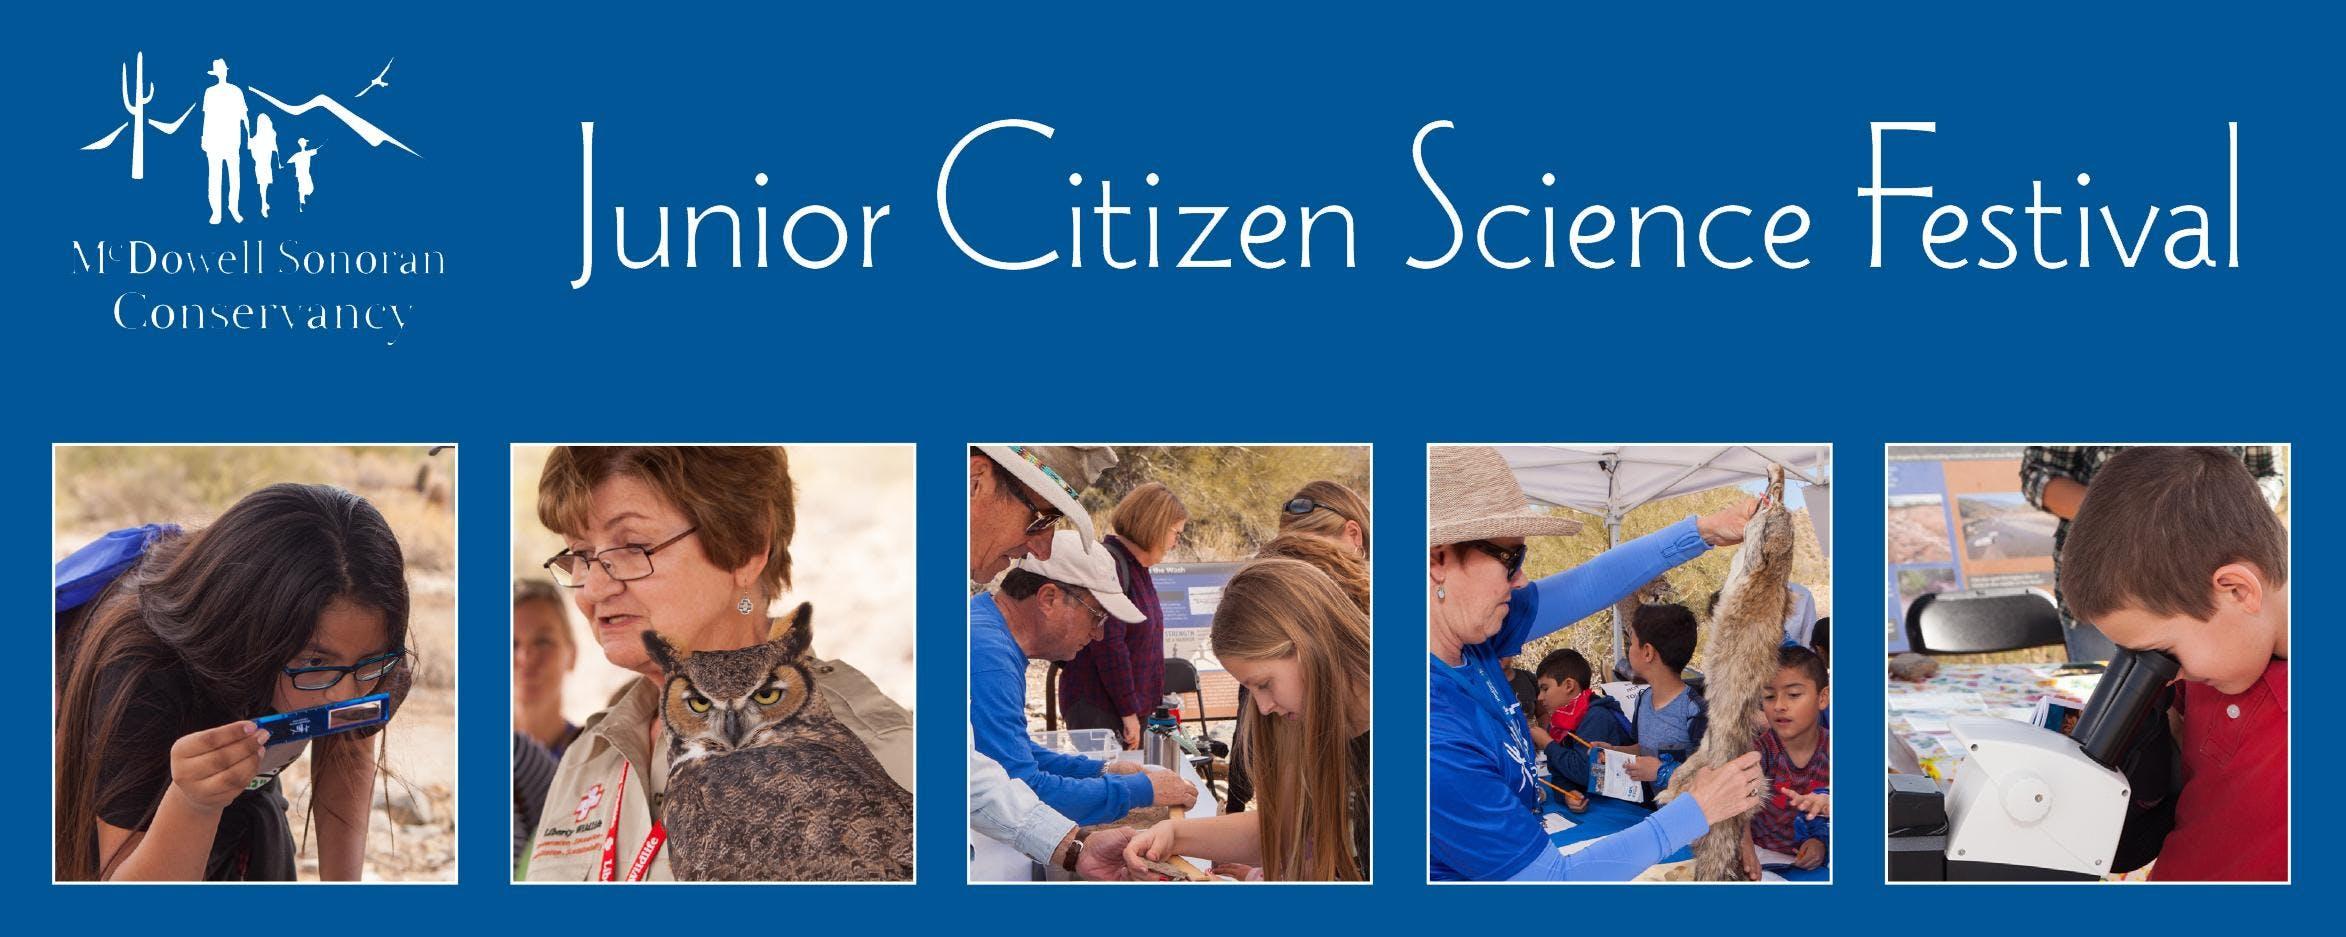 2019 Junior Citizen Science Festival